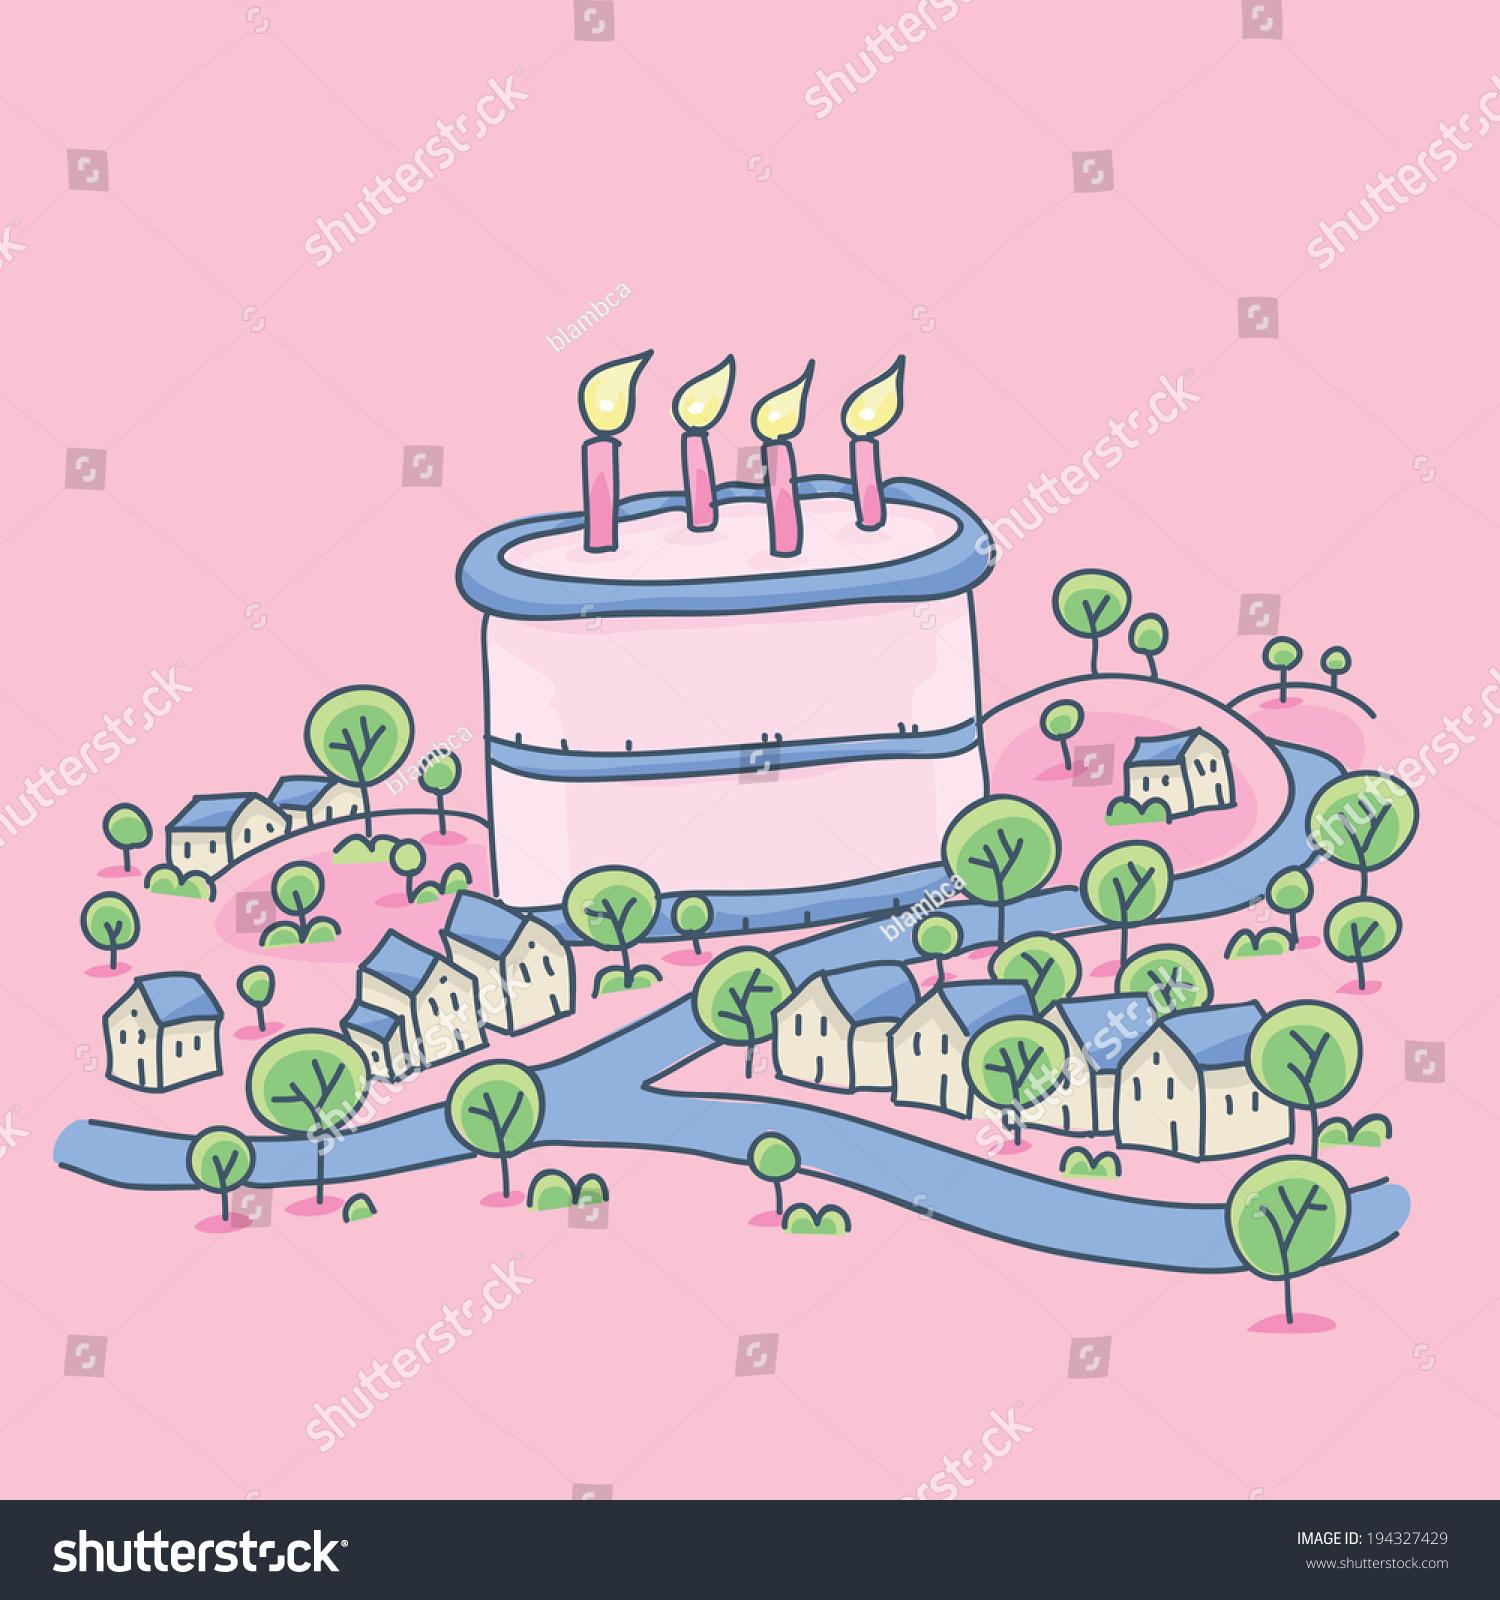 Small Cartoon Town Giant Birthday Cake Stock Vector 194327429